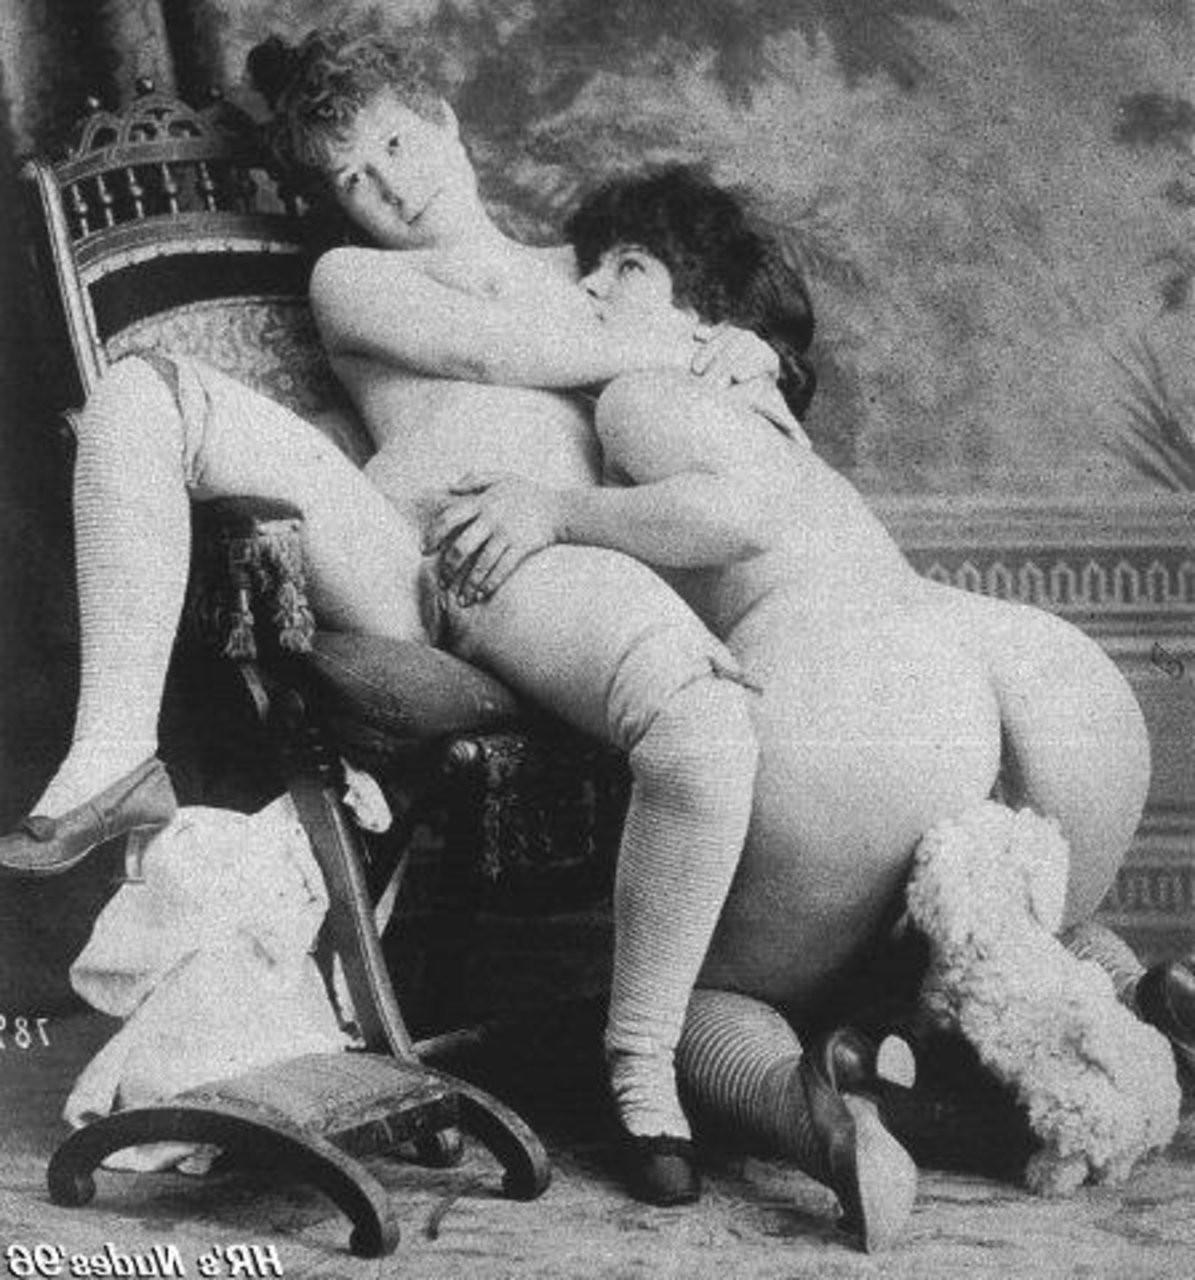 lesbian seduction pornhub – Lesbian